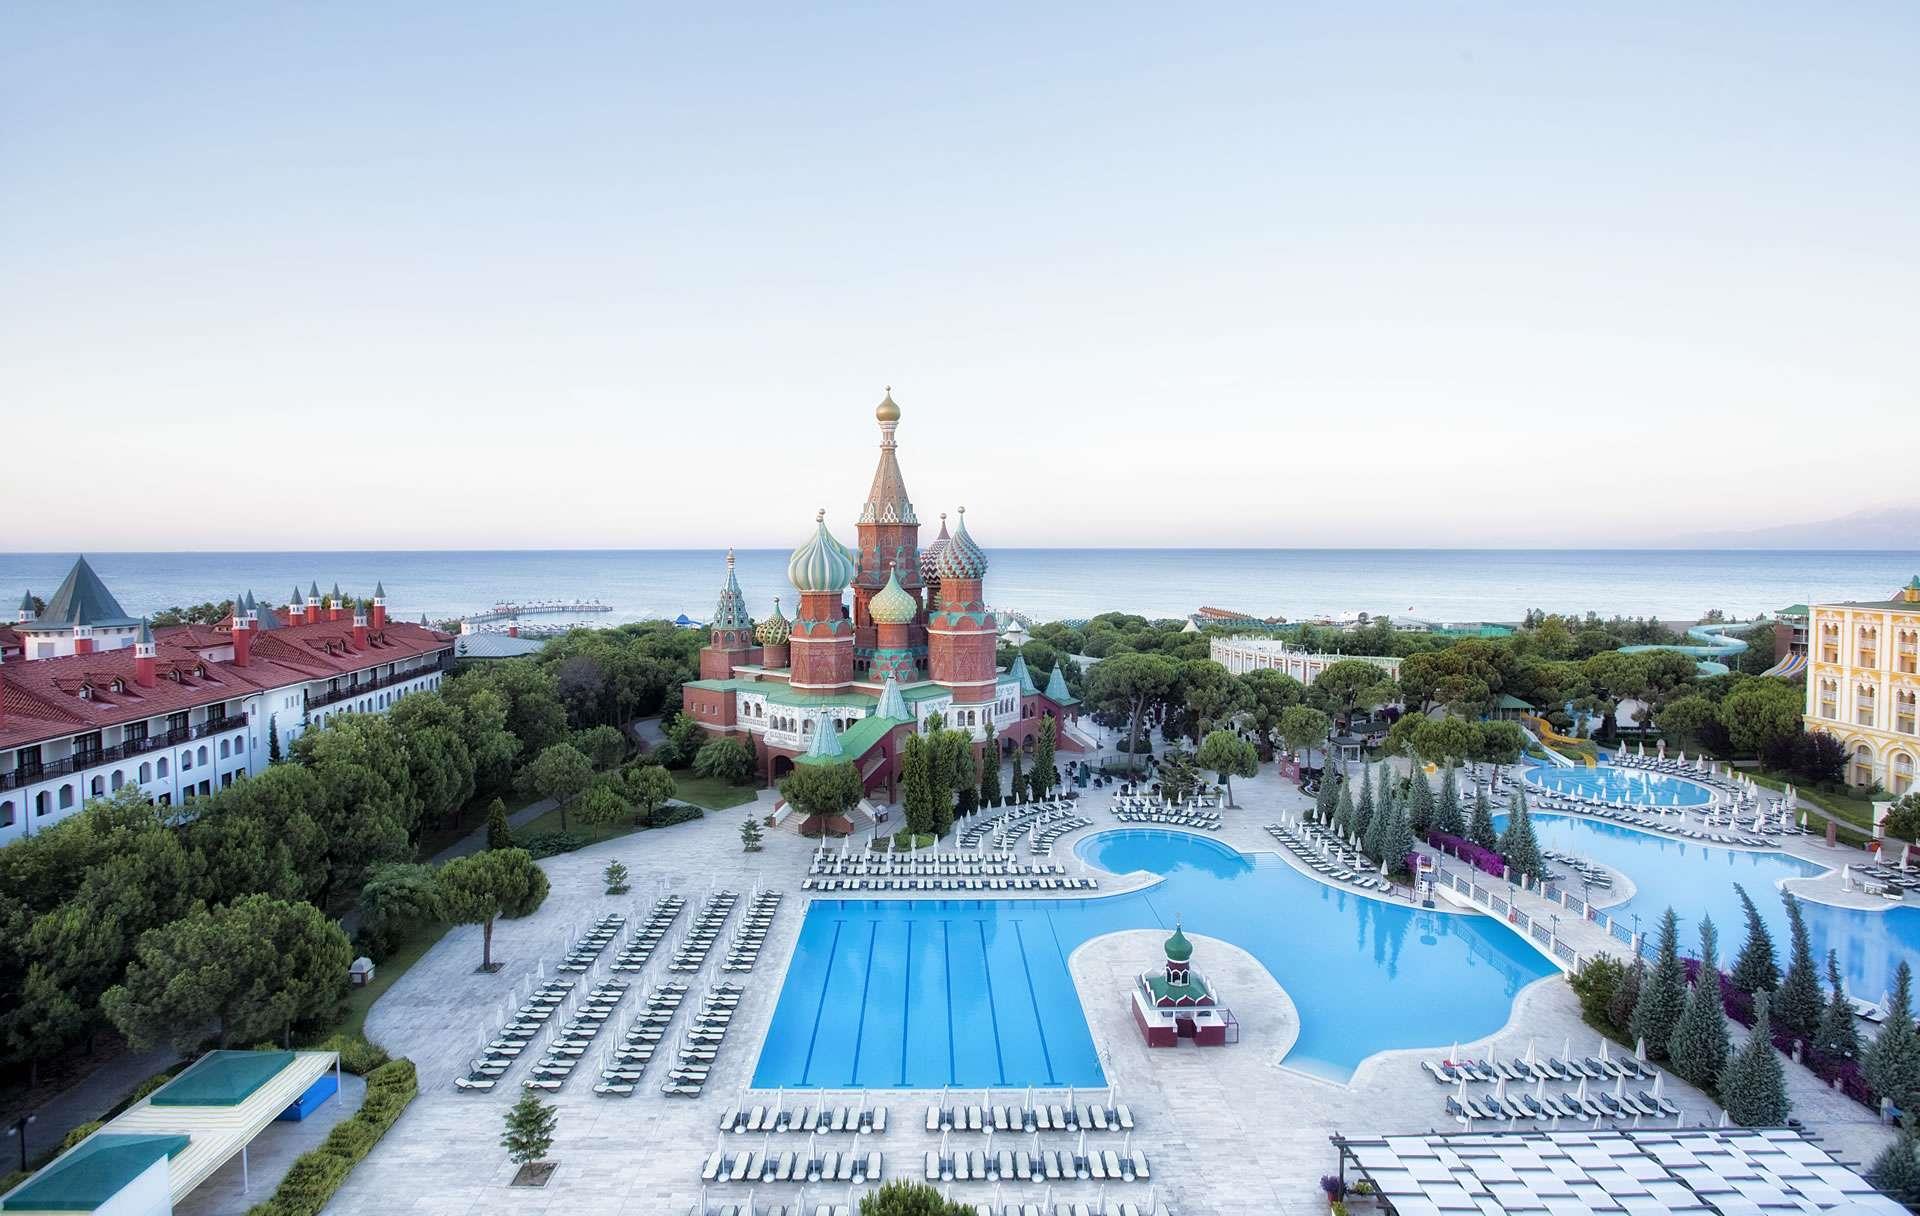 asteria-kremlin-palace-ex-pgs-kremlin-palace-genel-0011